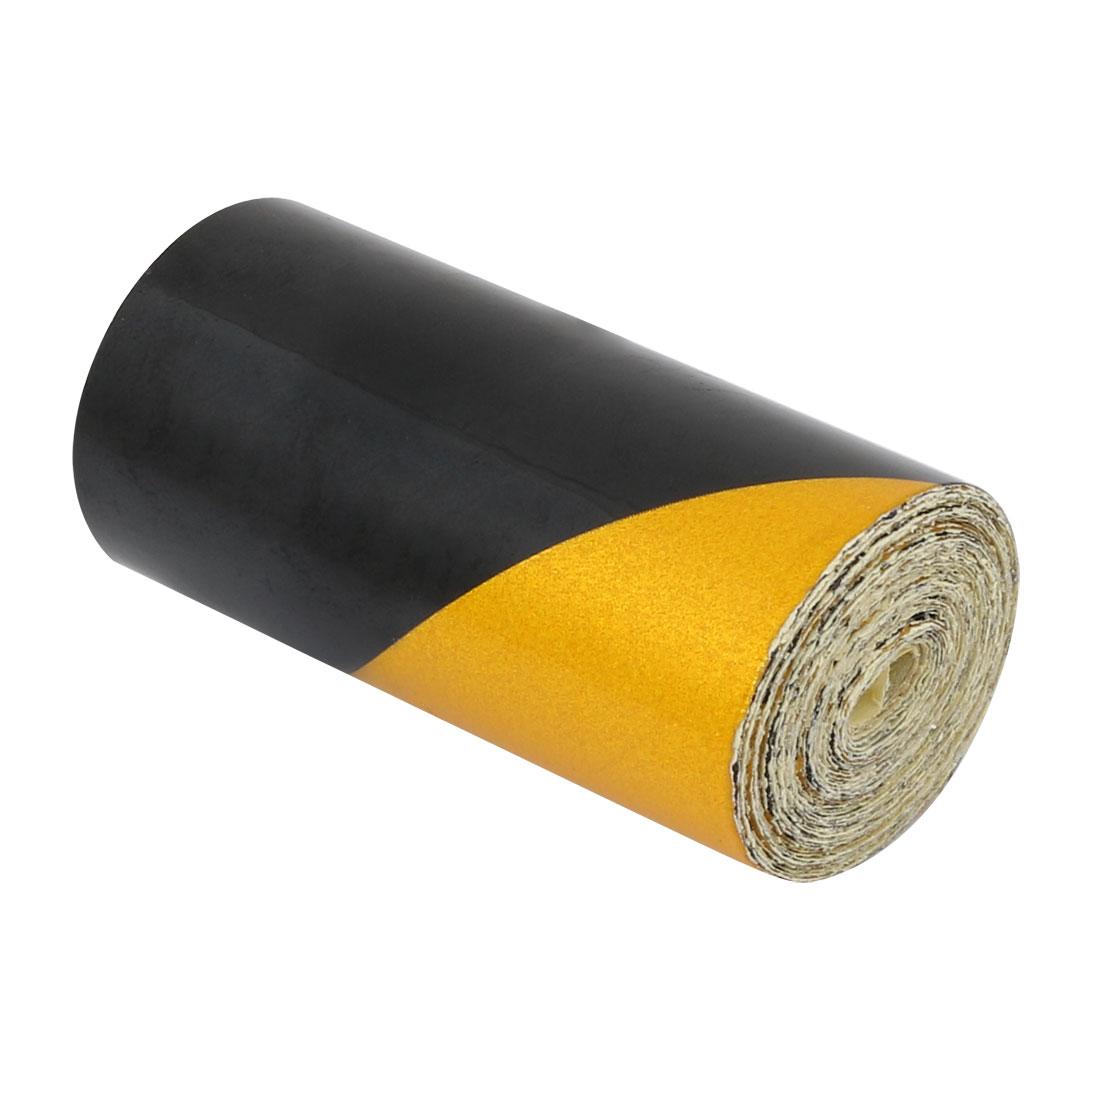 5cm Wide 2M Long Single Sided Adhesive Reflective Warning Tape Yellow Black